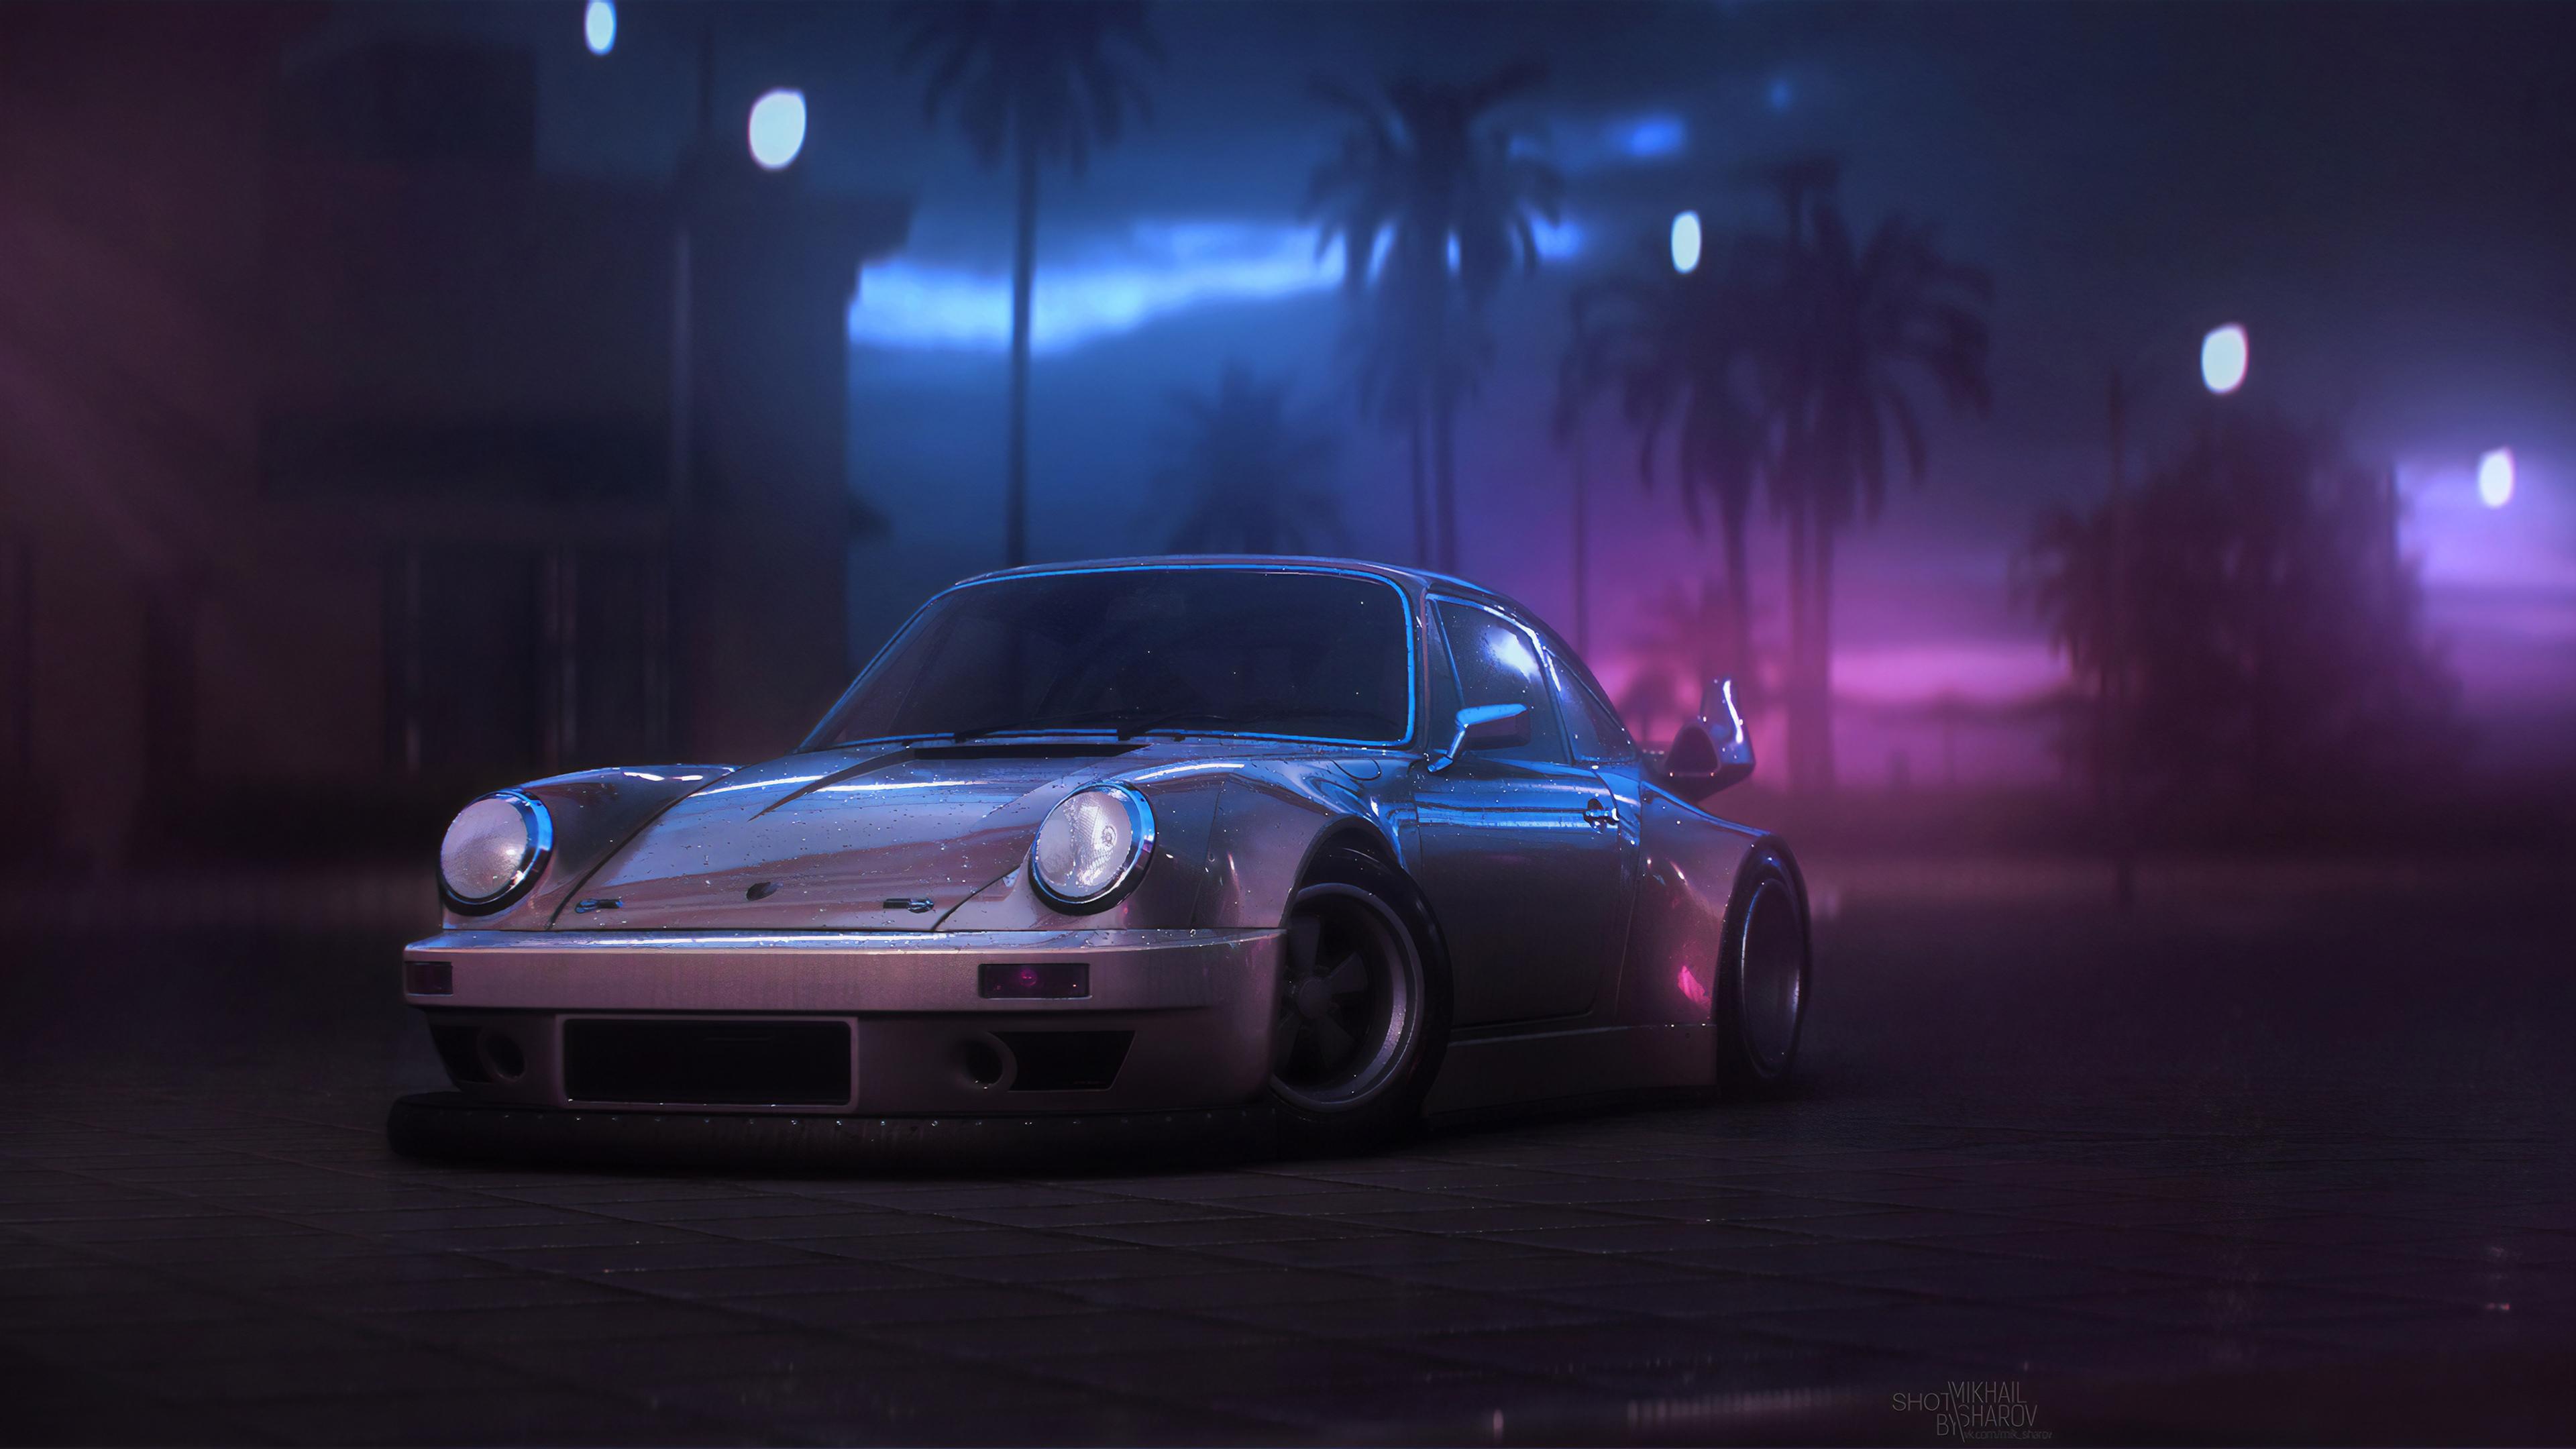 Wallpaper 4k Porsche 911 Carrera Rsr Need For Speed 4k